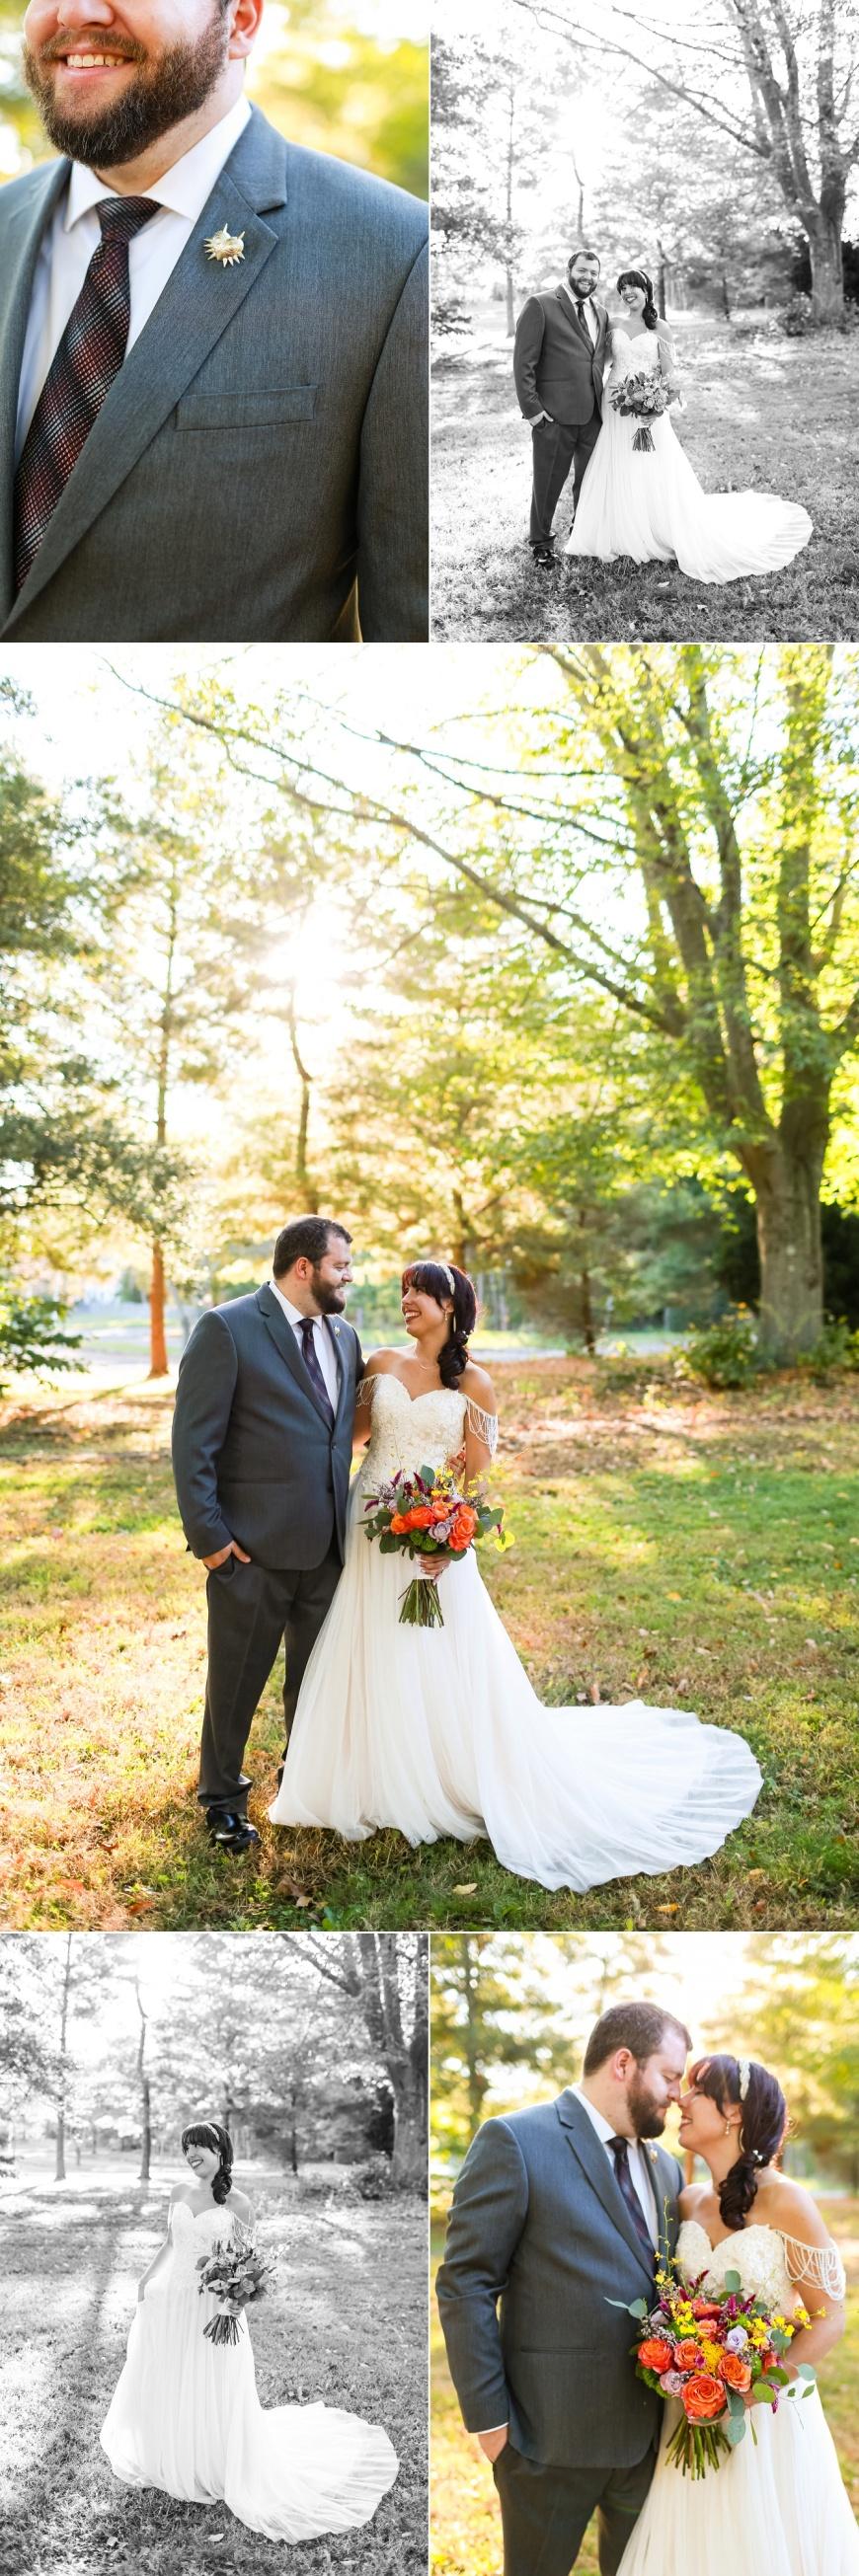 Mercer-Museum-Wedding-Photographer_1042.jpg